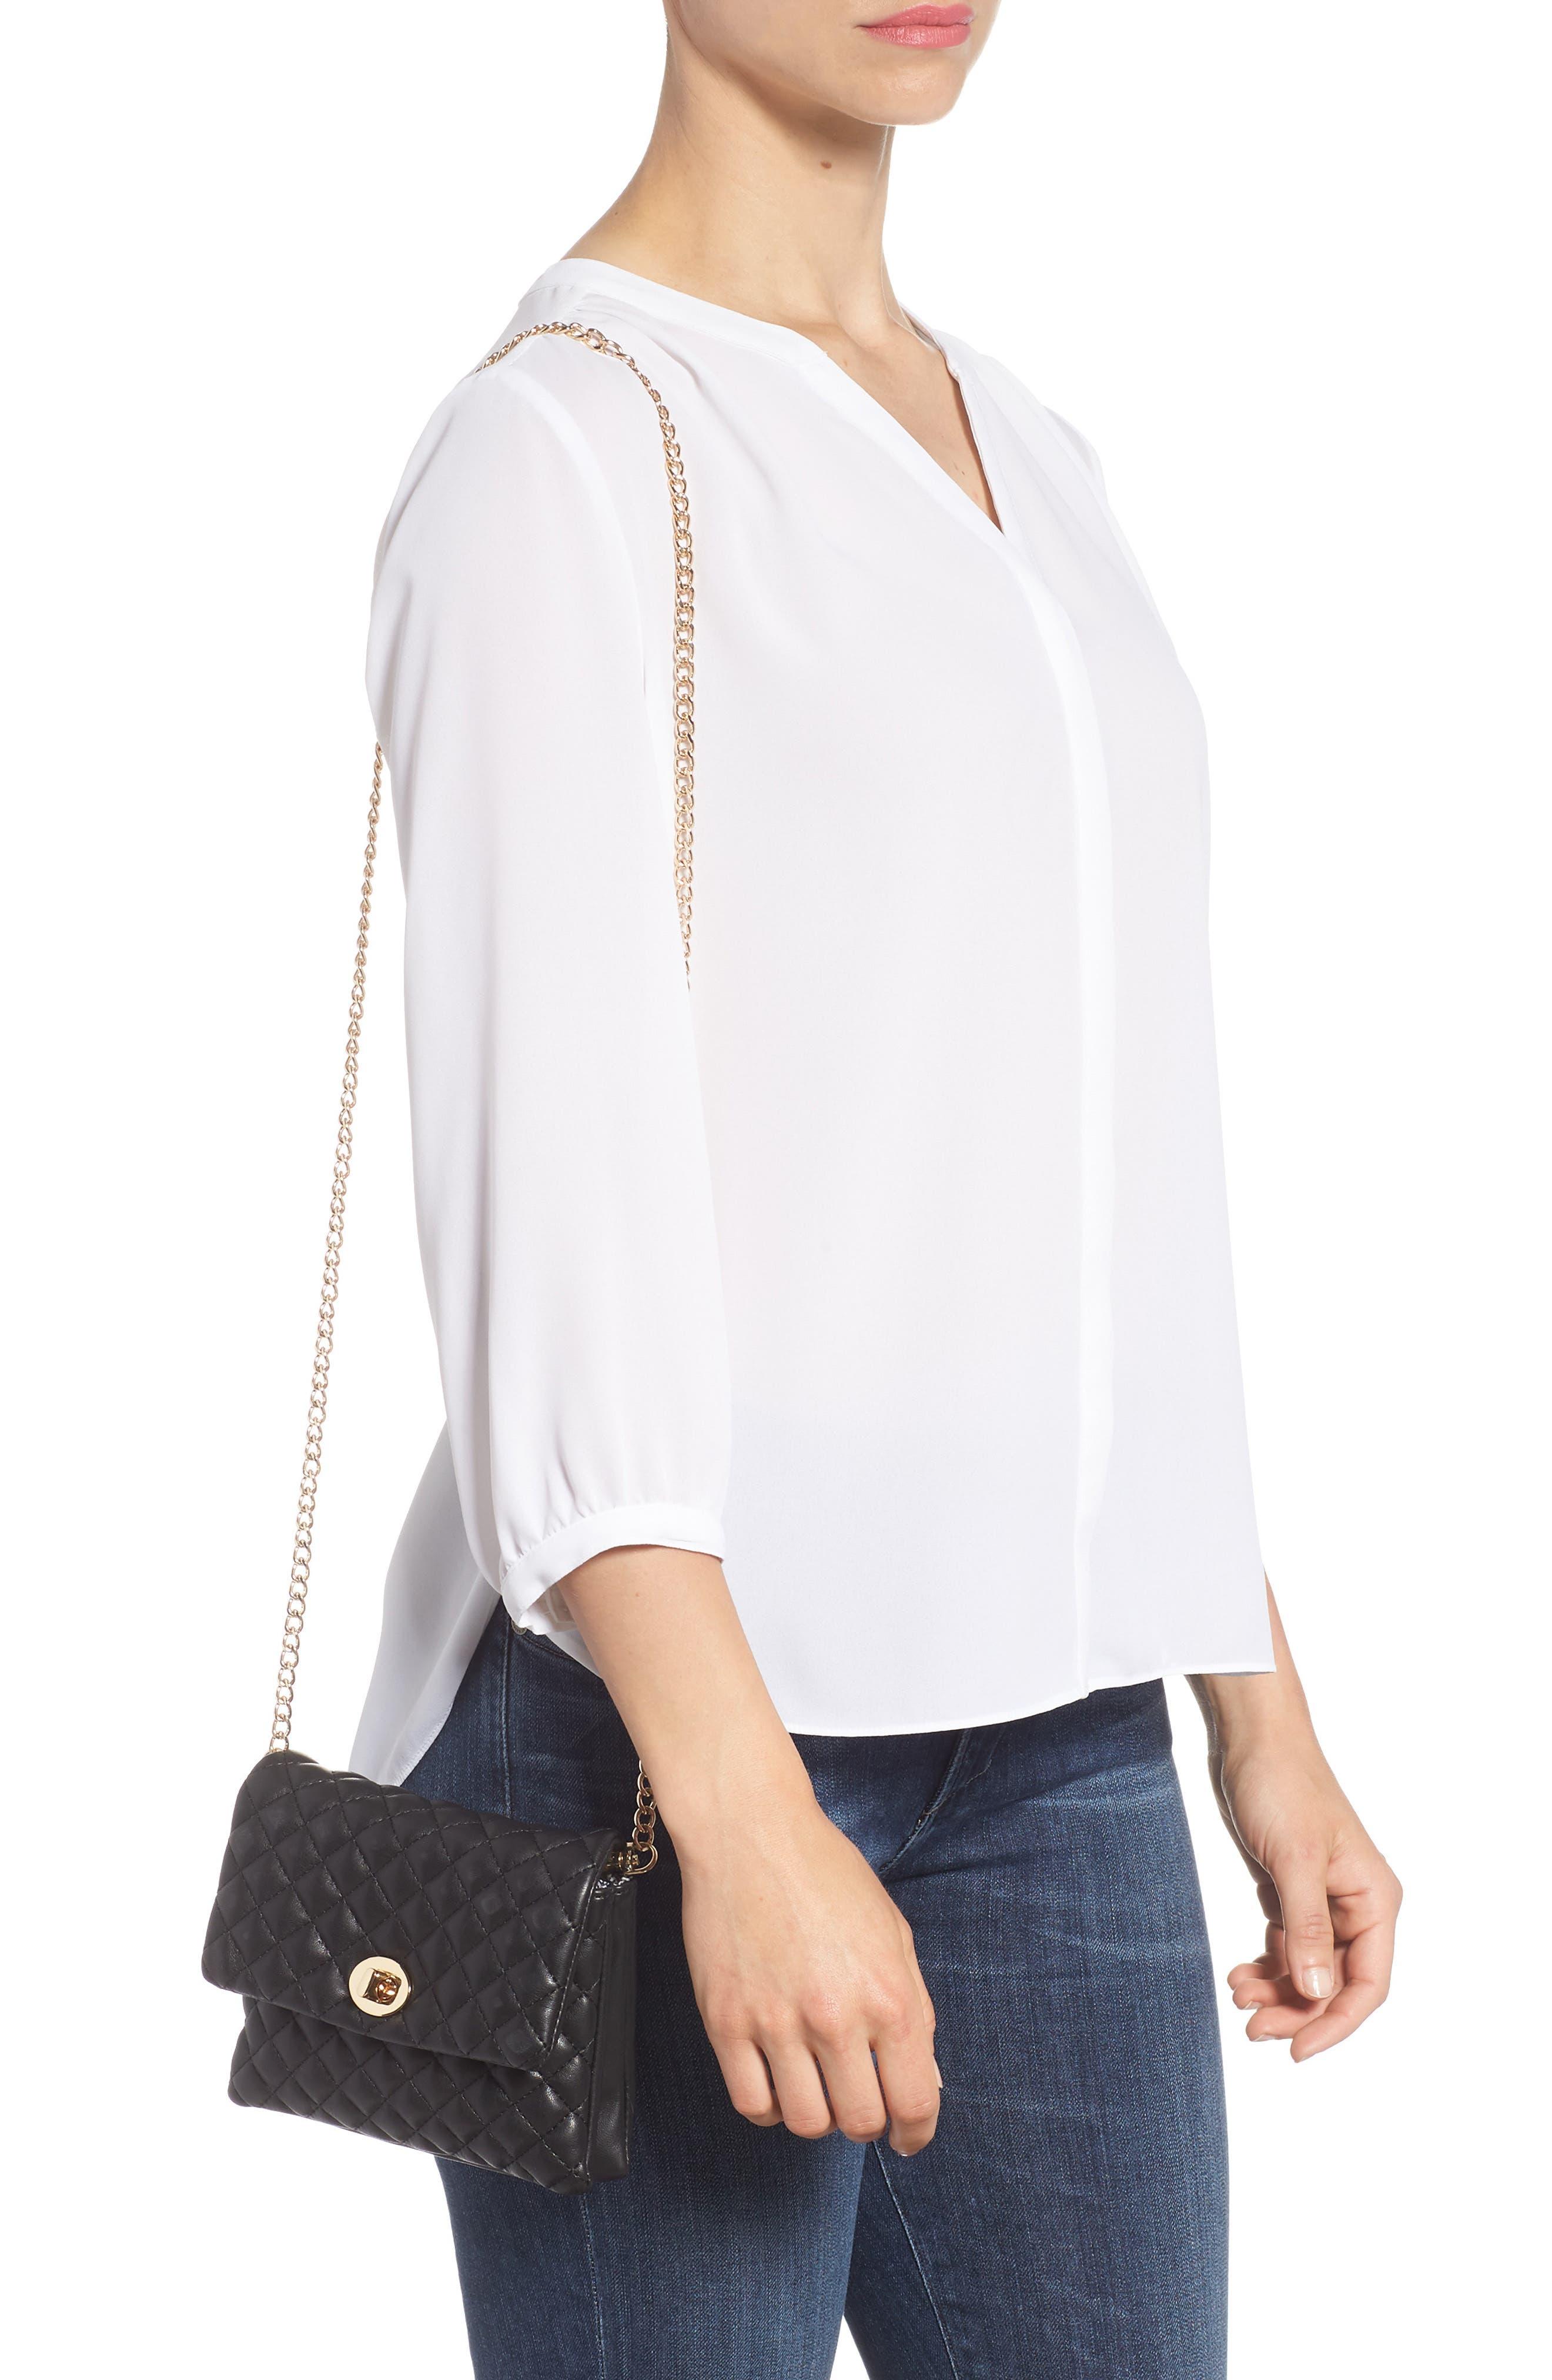 Mali + Lili Quilted Vegan Leather Convertible Belt Bag,                             Alternate thumbnail 9, color,                             Black